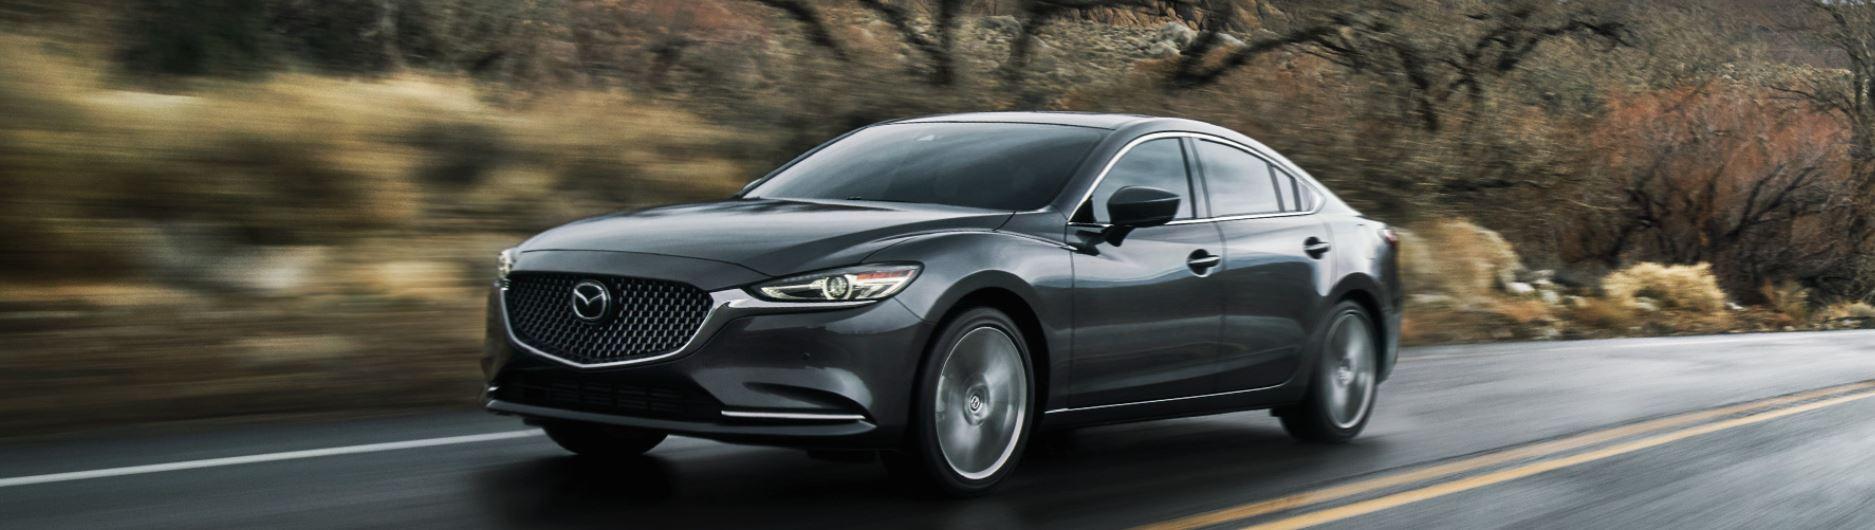 2019 Mazda6 for Sale near Galena Park, TX